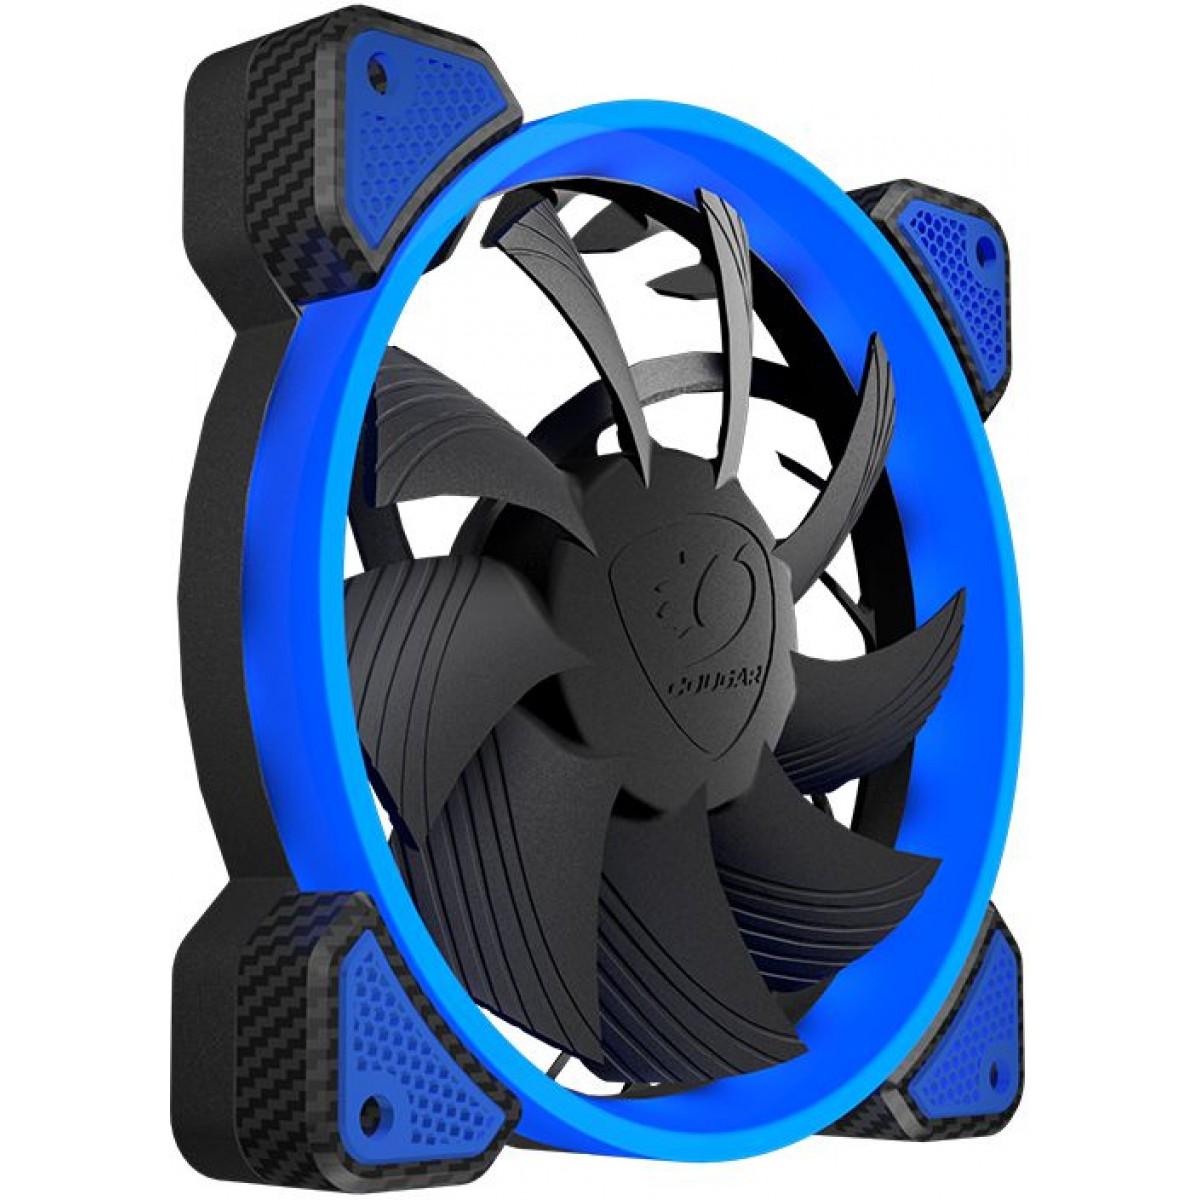 Cooler para Gabinete Cougar Vortex FB, 120mm, Azul, 3MFB120X-0001